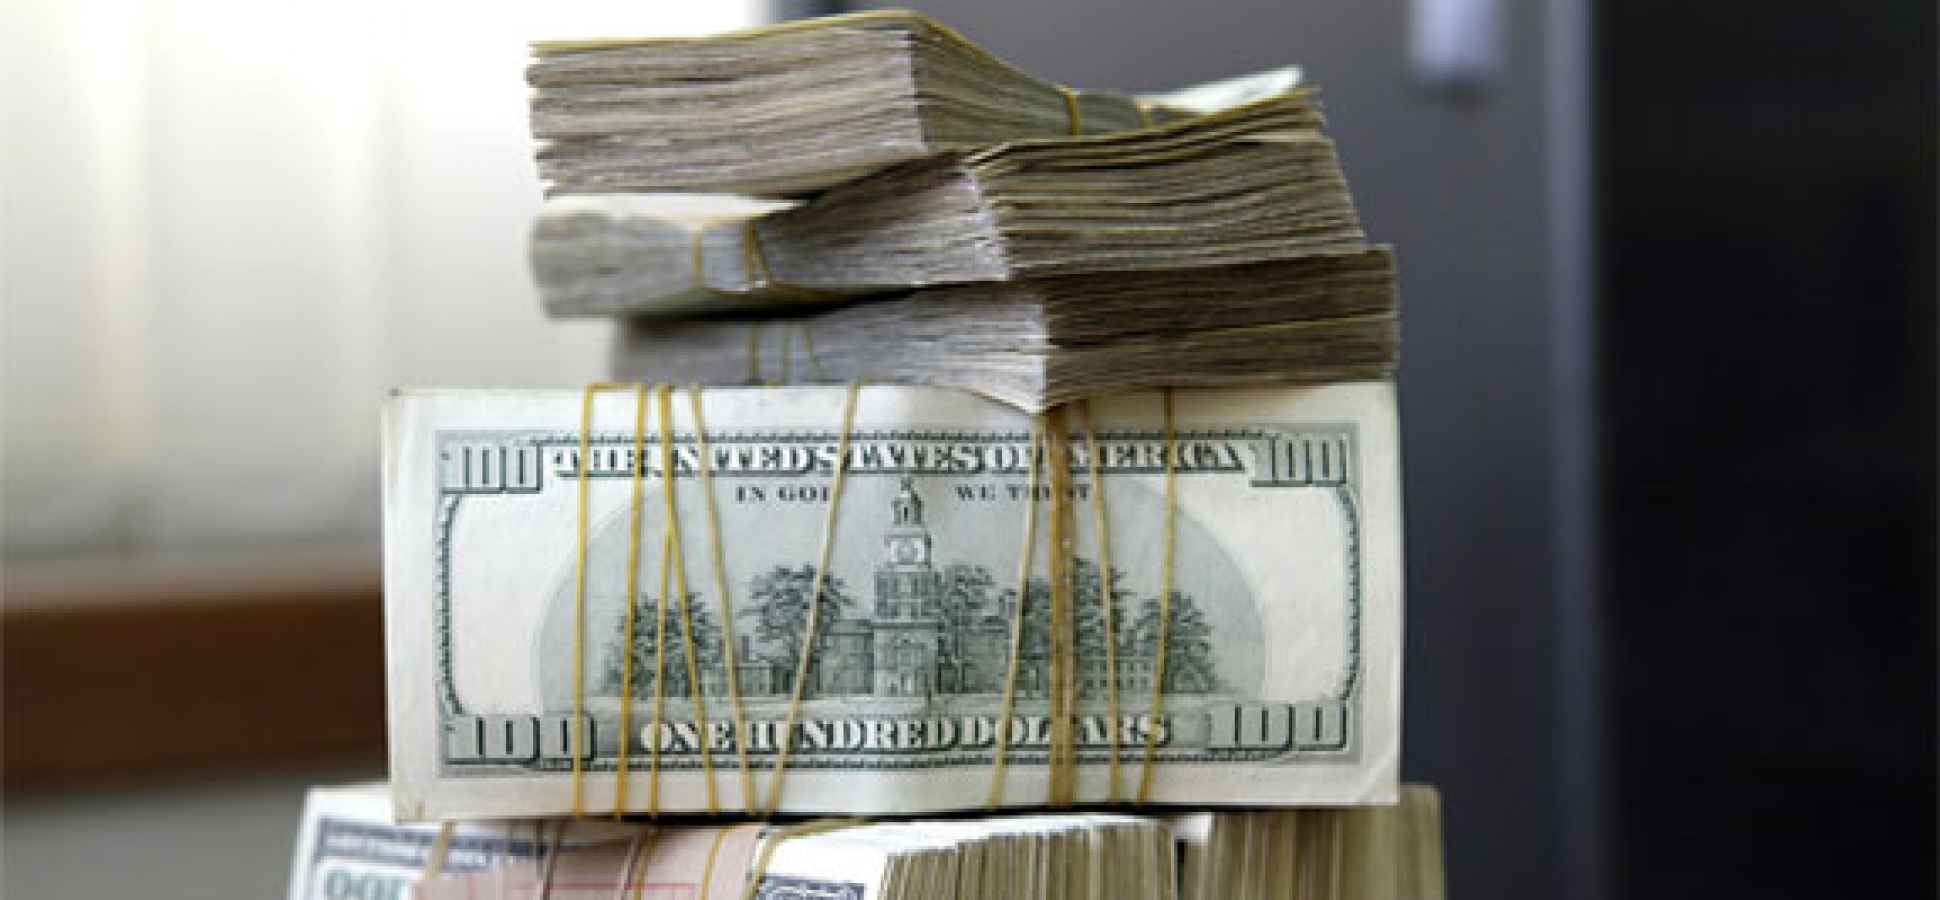 Payday loans juneau alaska picture 2